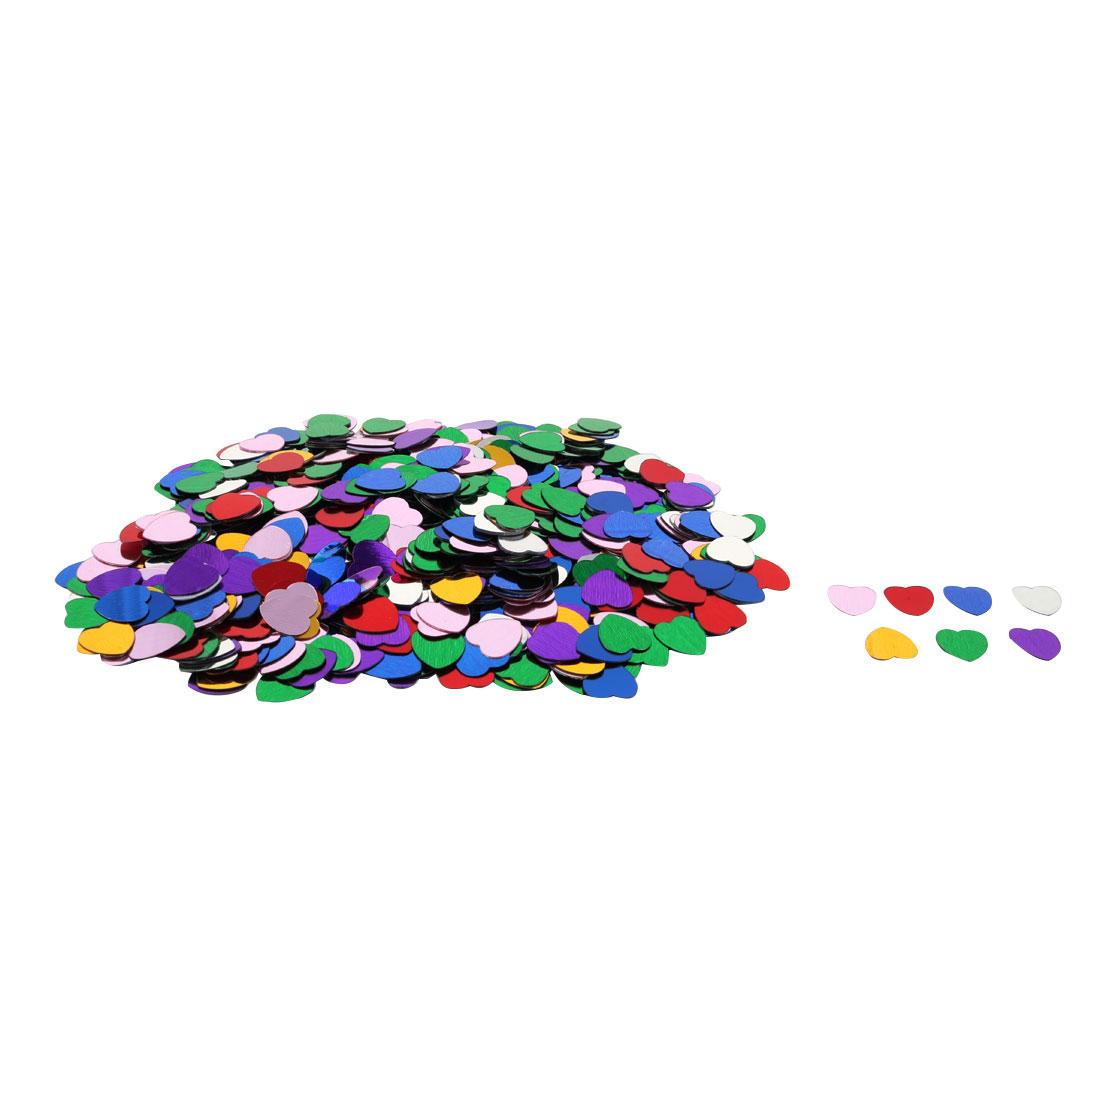 Wedding Plastic Heart Shaped Romance DIY Crystal Table Decor Assorted Color 500 Pcs